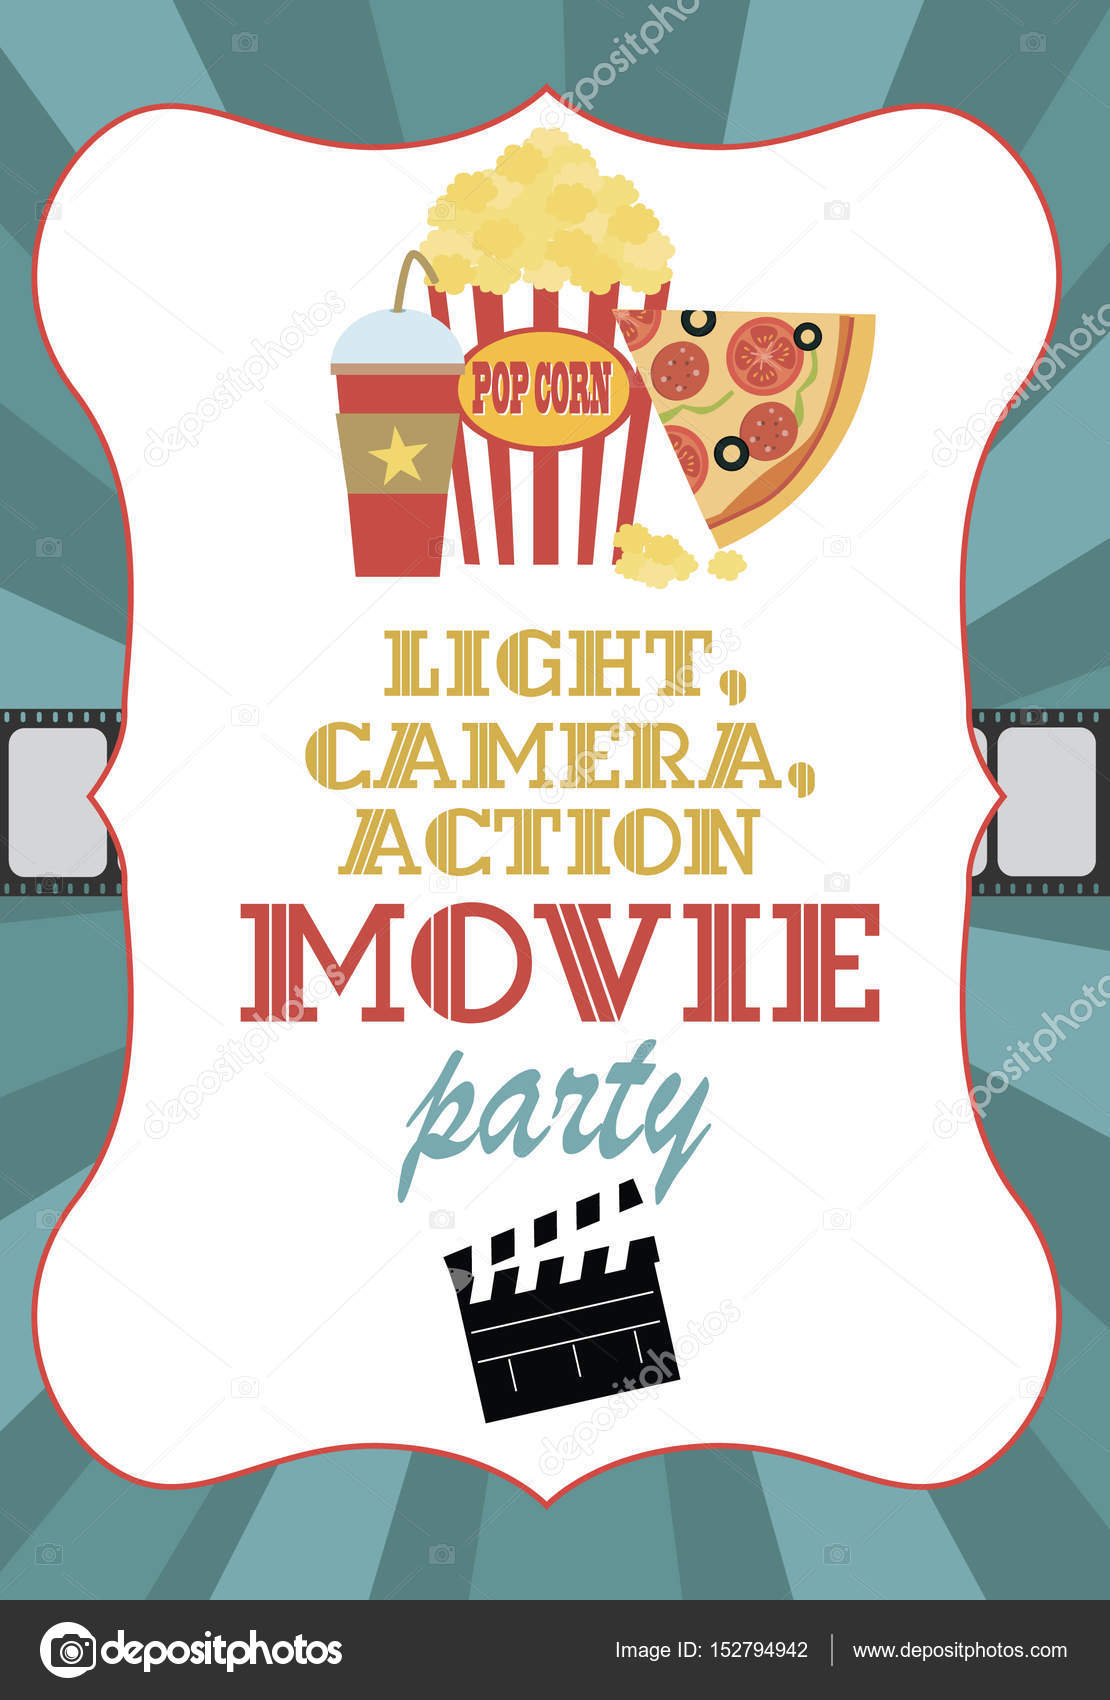 Film-Geburtstag-Party-Einladung-Karte — Stockvektor © Vissay #152794942